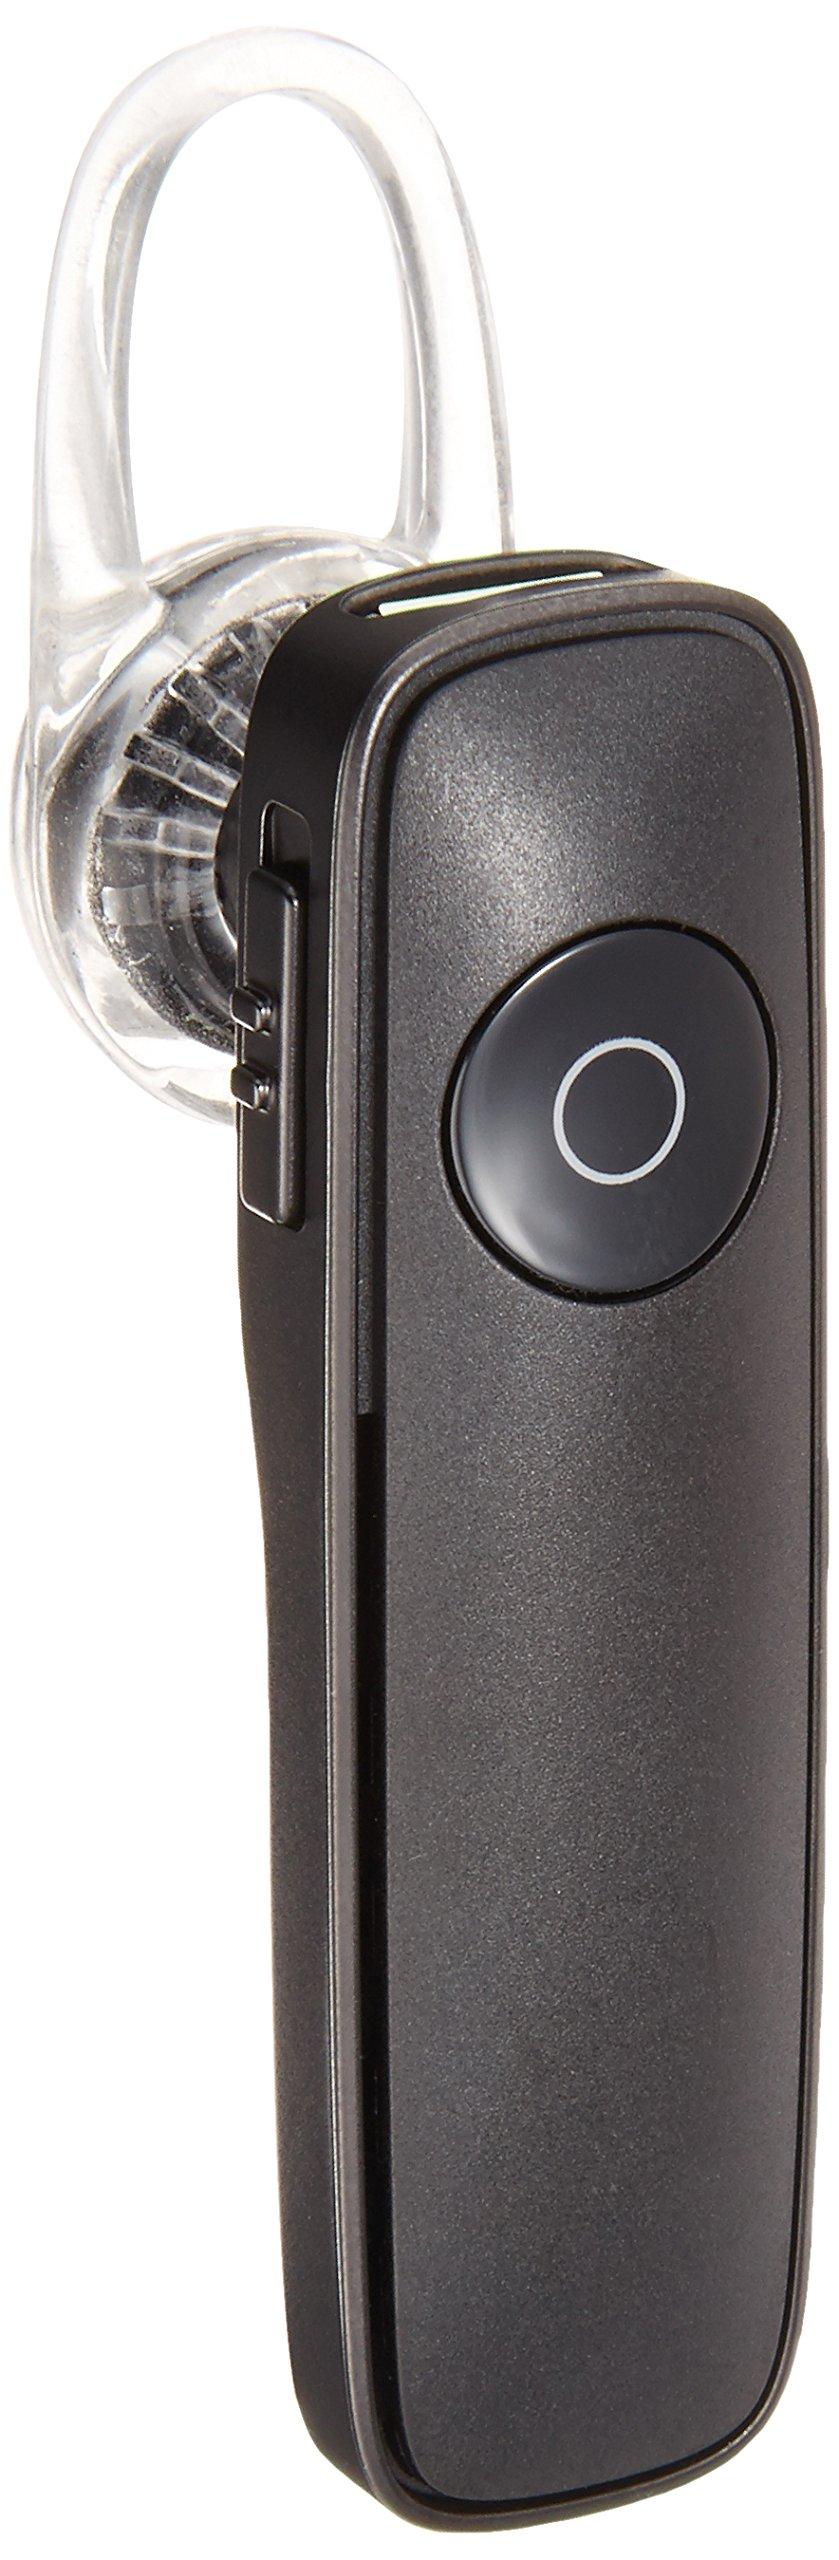 Plantronics Bluetooth Wireless Headset Marque2 M165